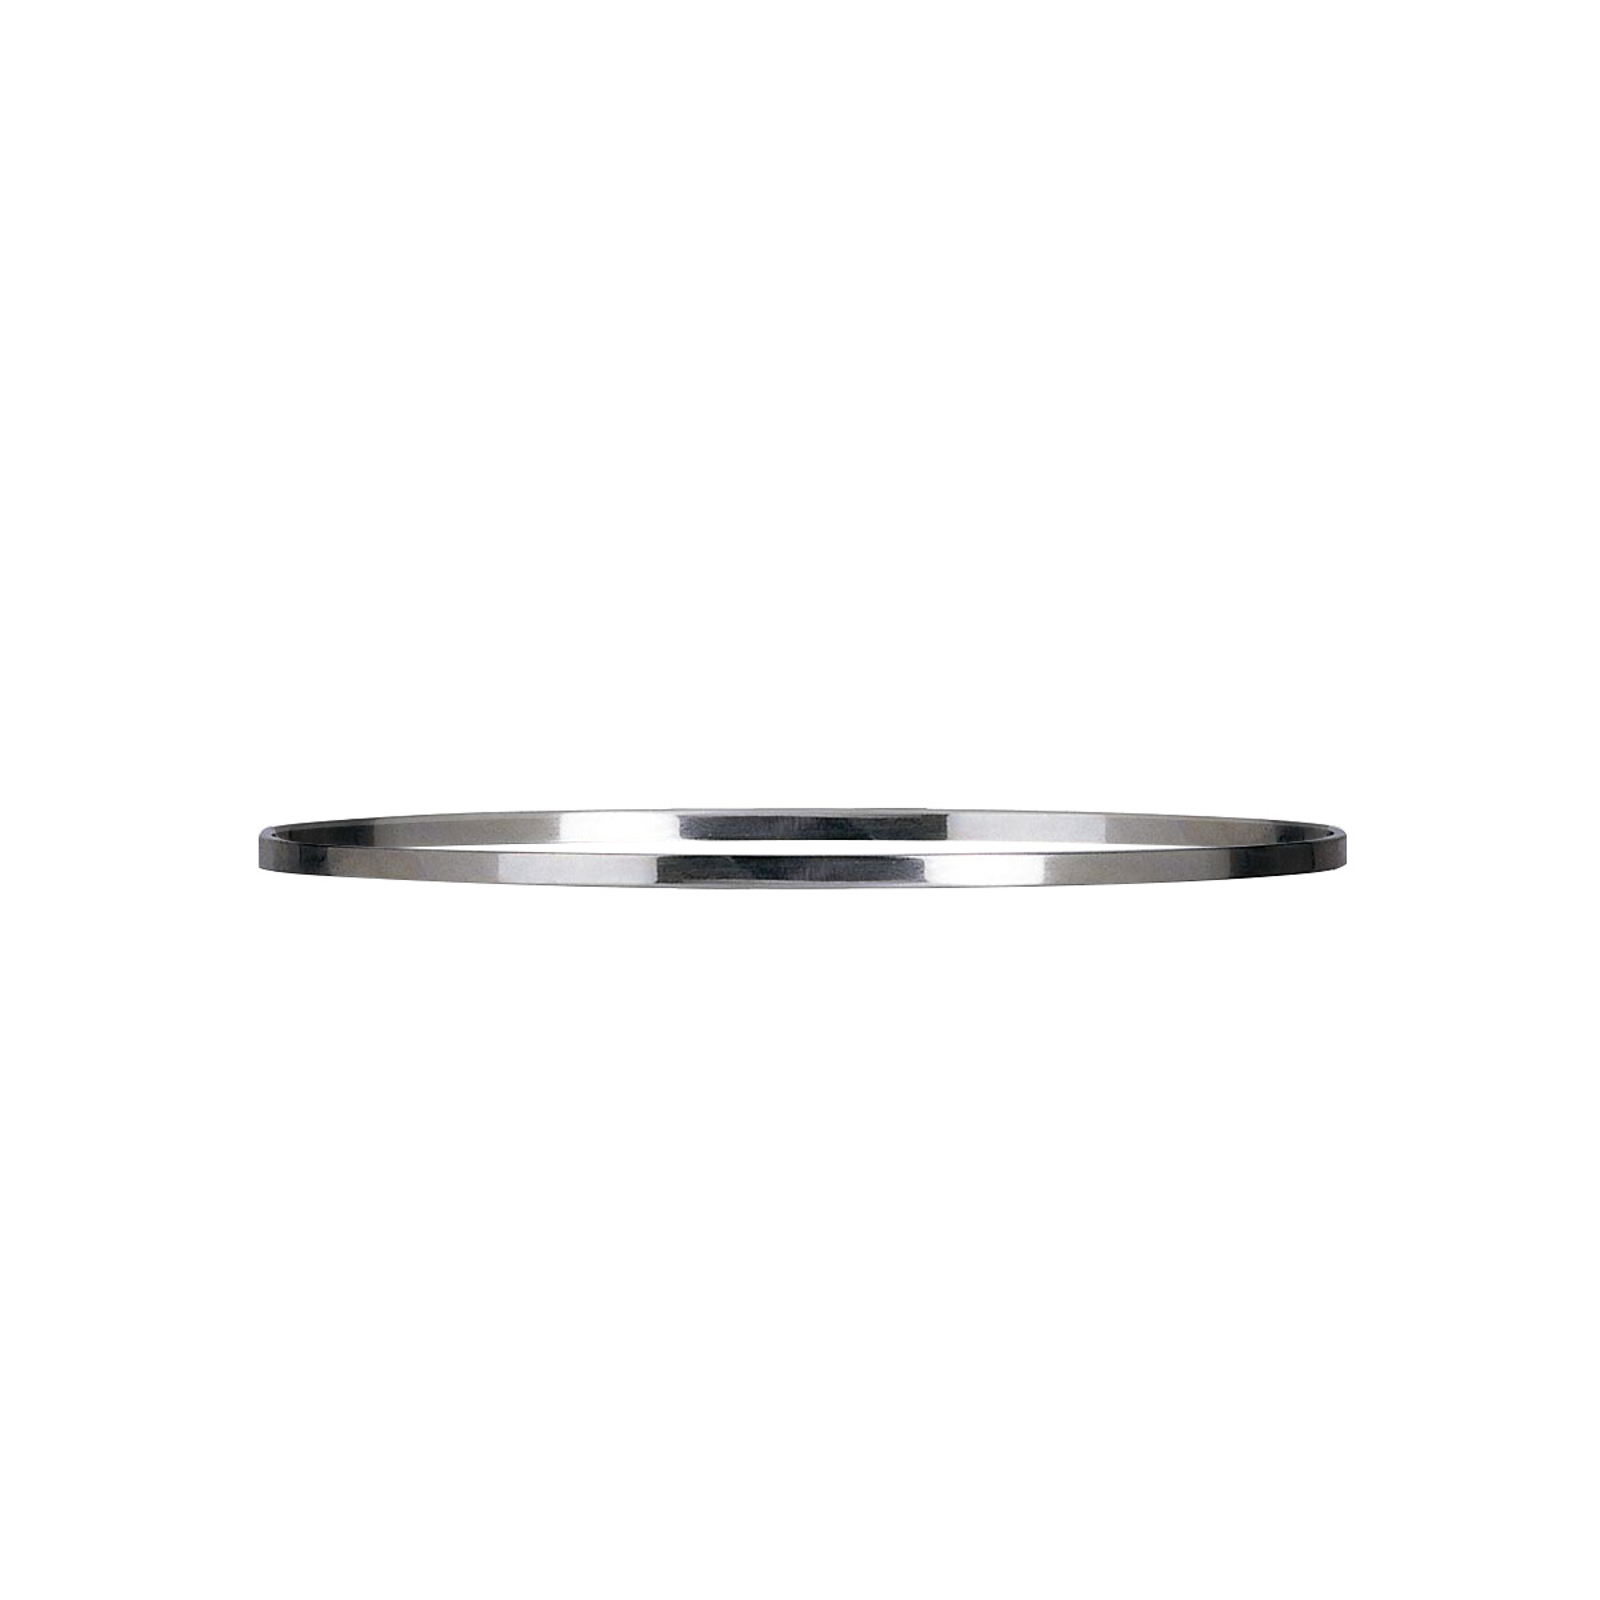 Ring v vervangend glasscherm Wagenfeld tafellamp